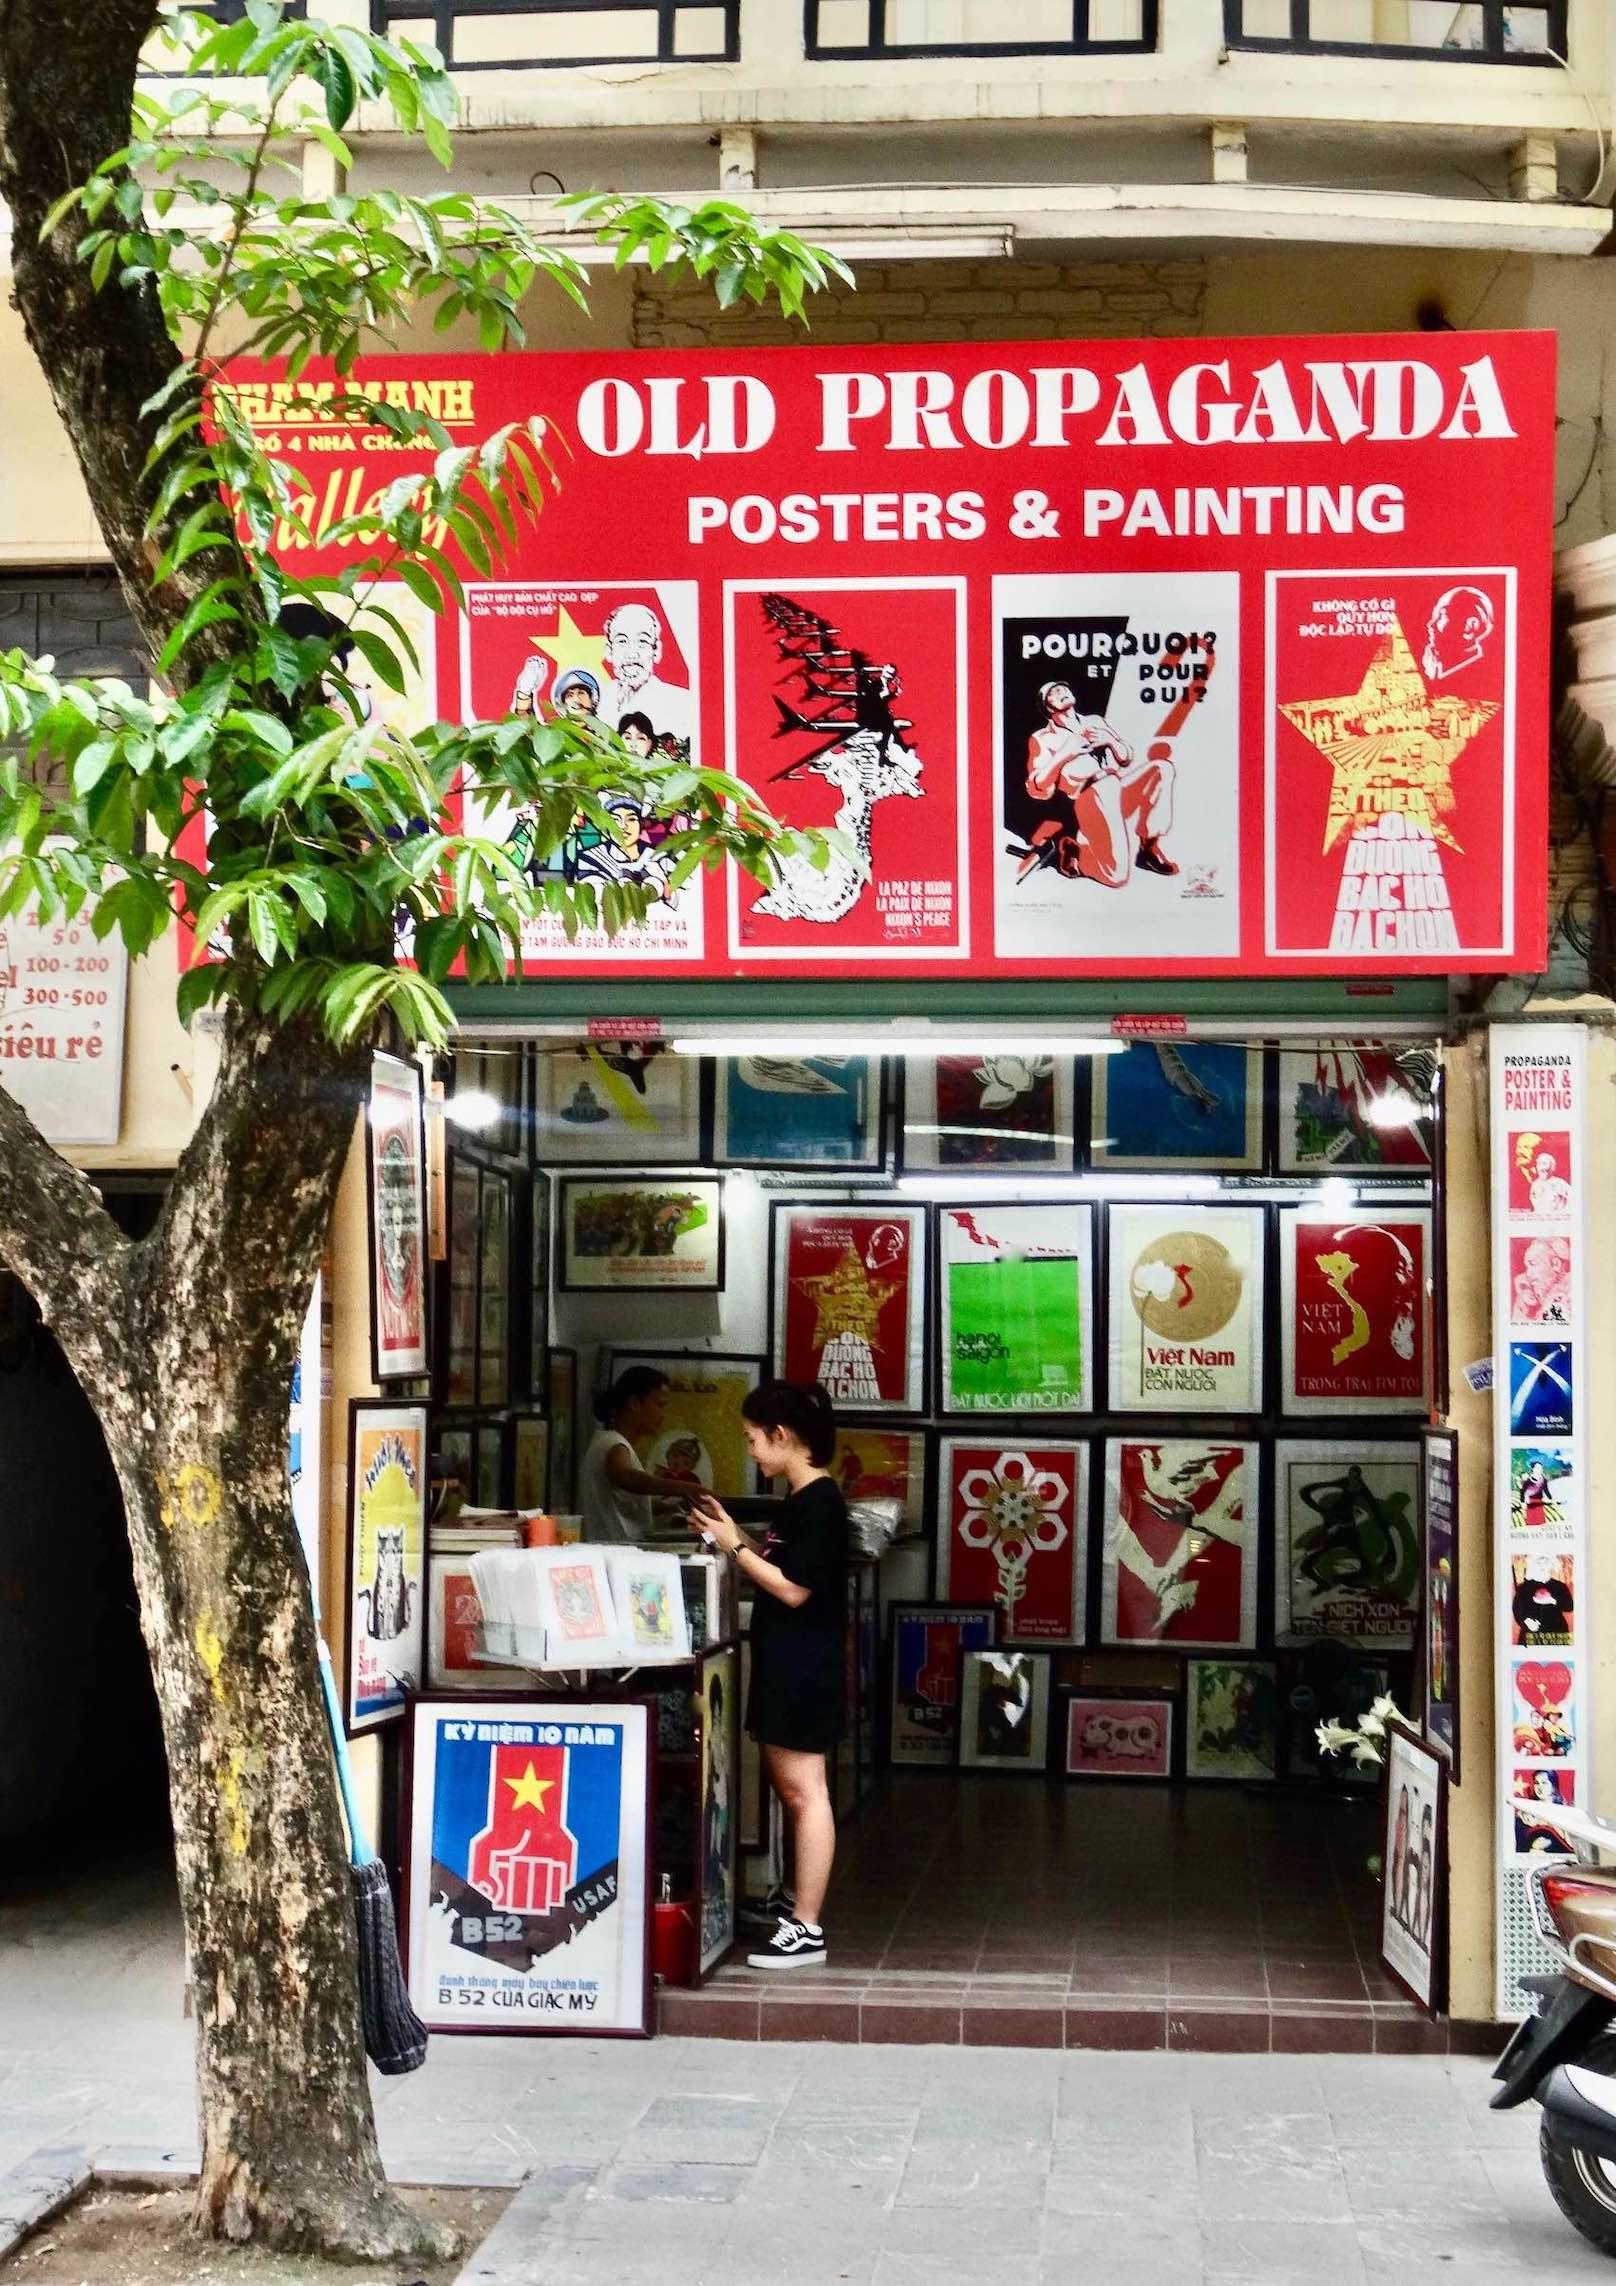 Pham Manh Gallery Propaganda Posters and Paintings Hanoi